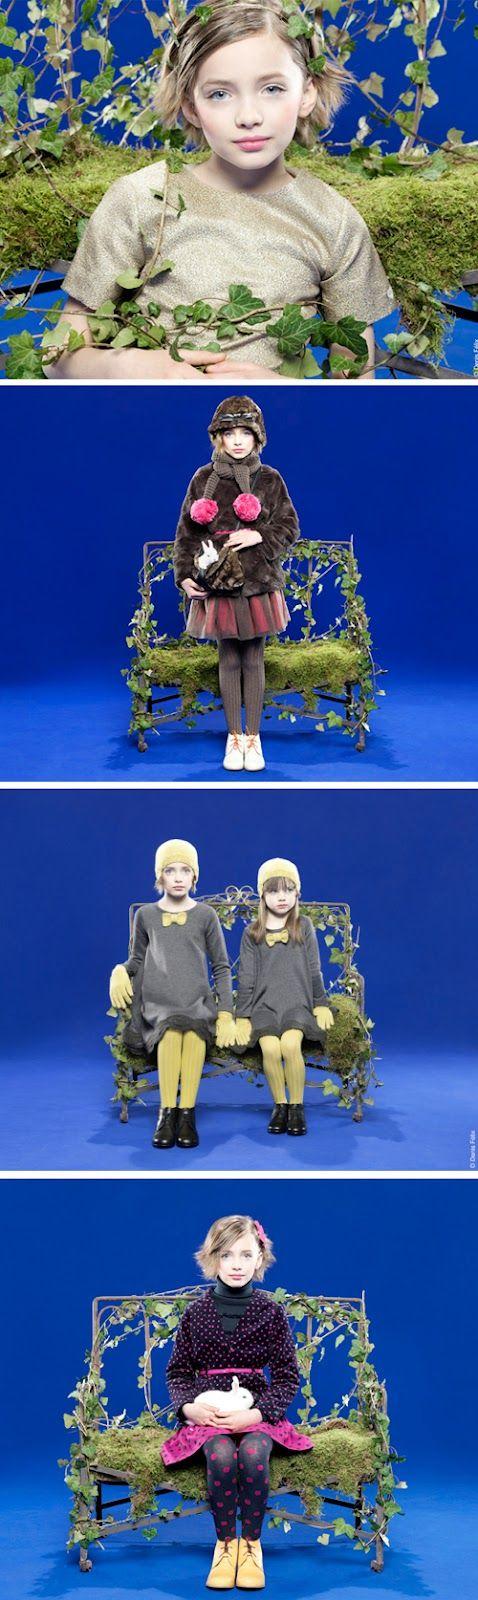 Lili Gaufrette Winter 2012 via Studio ToutPetit